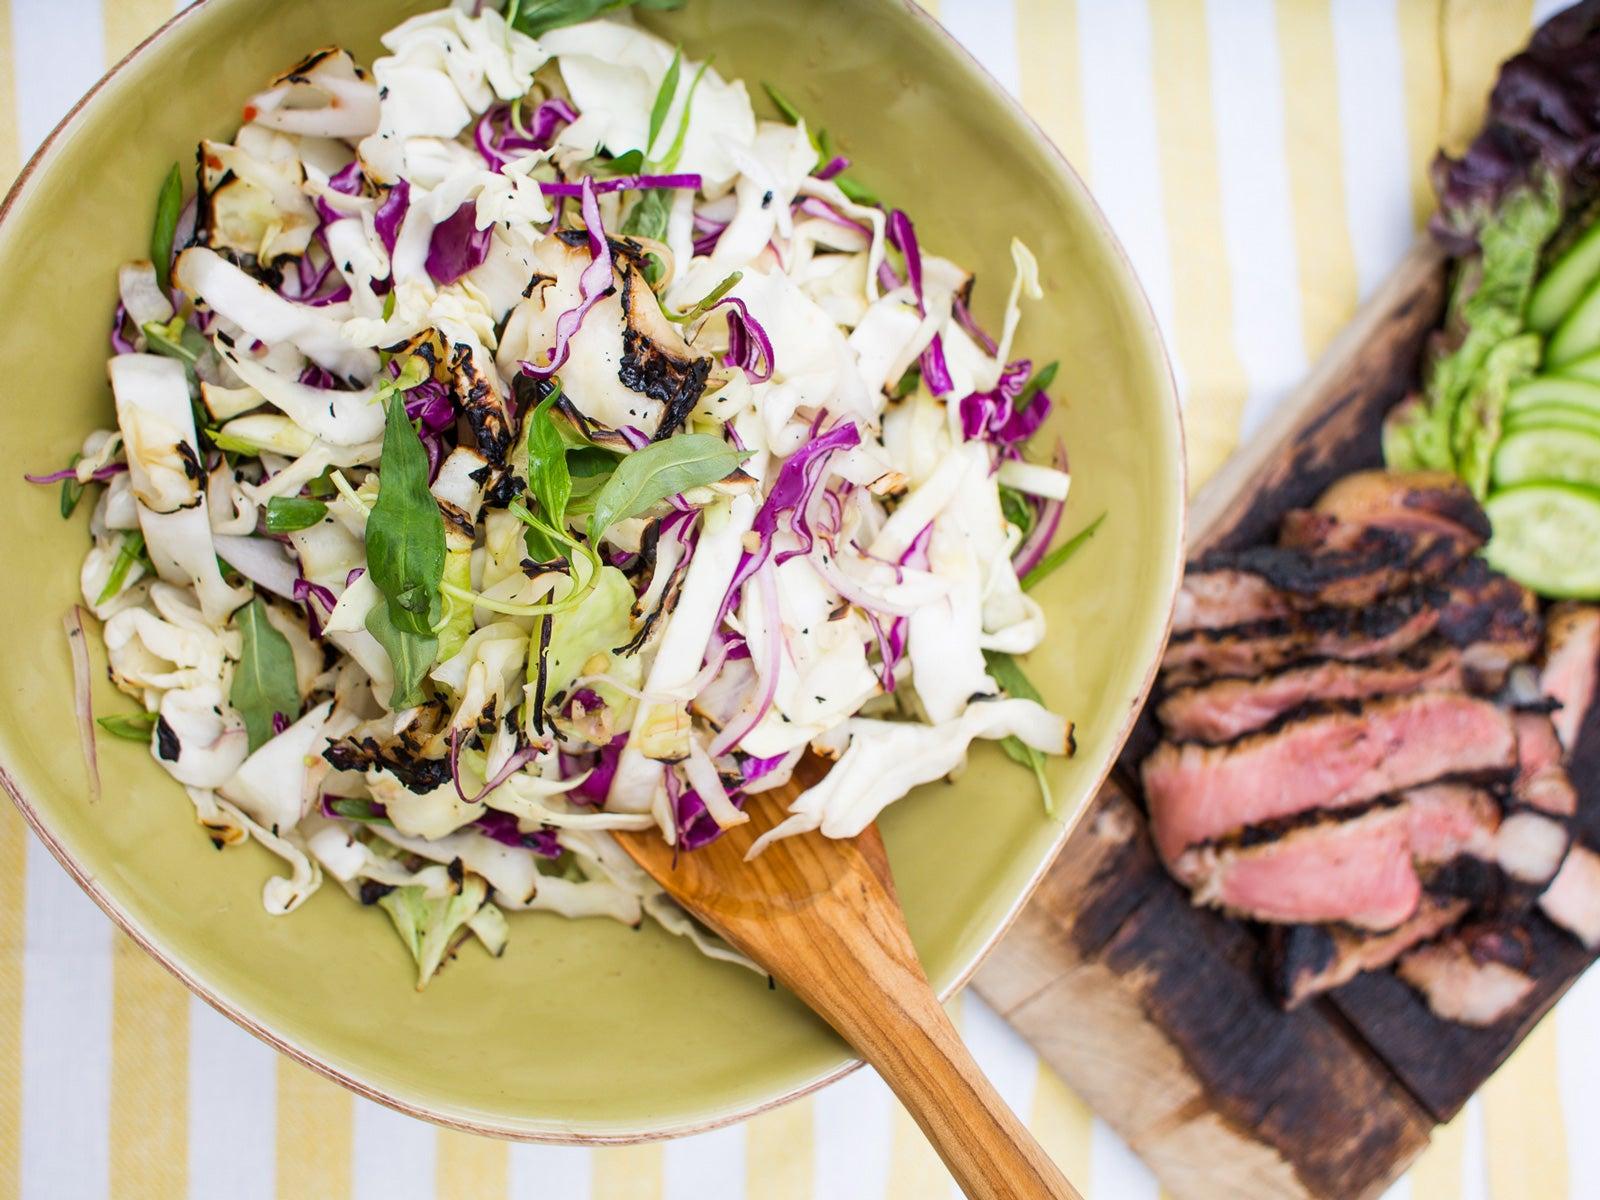 Houston, Chris Shepherd, Grilling, Cabbage Slaw